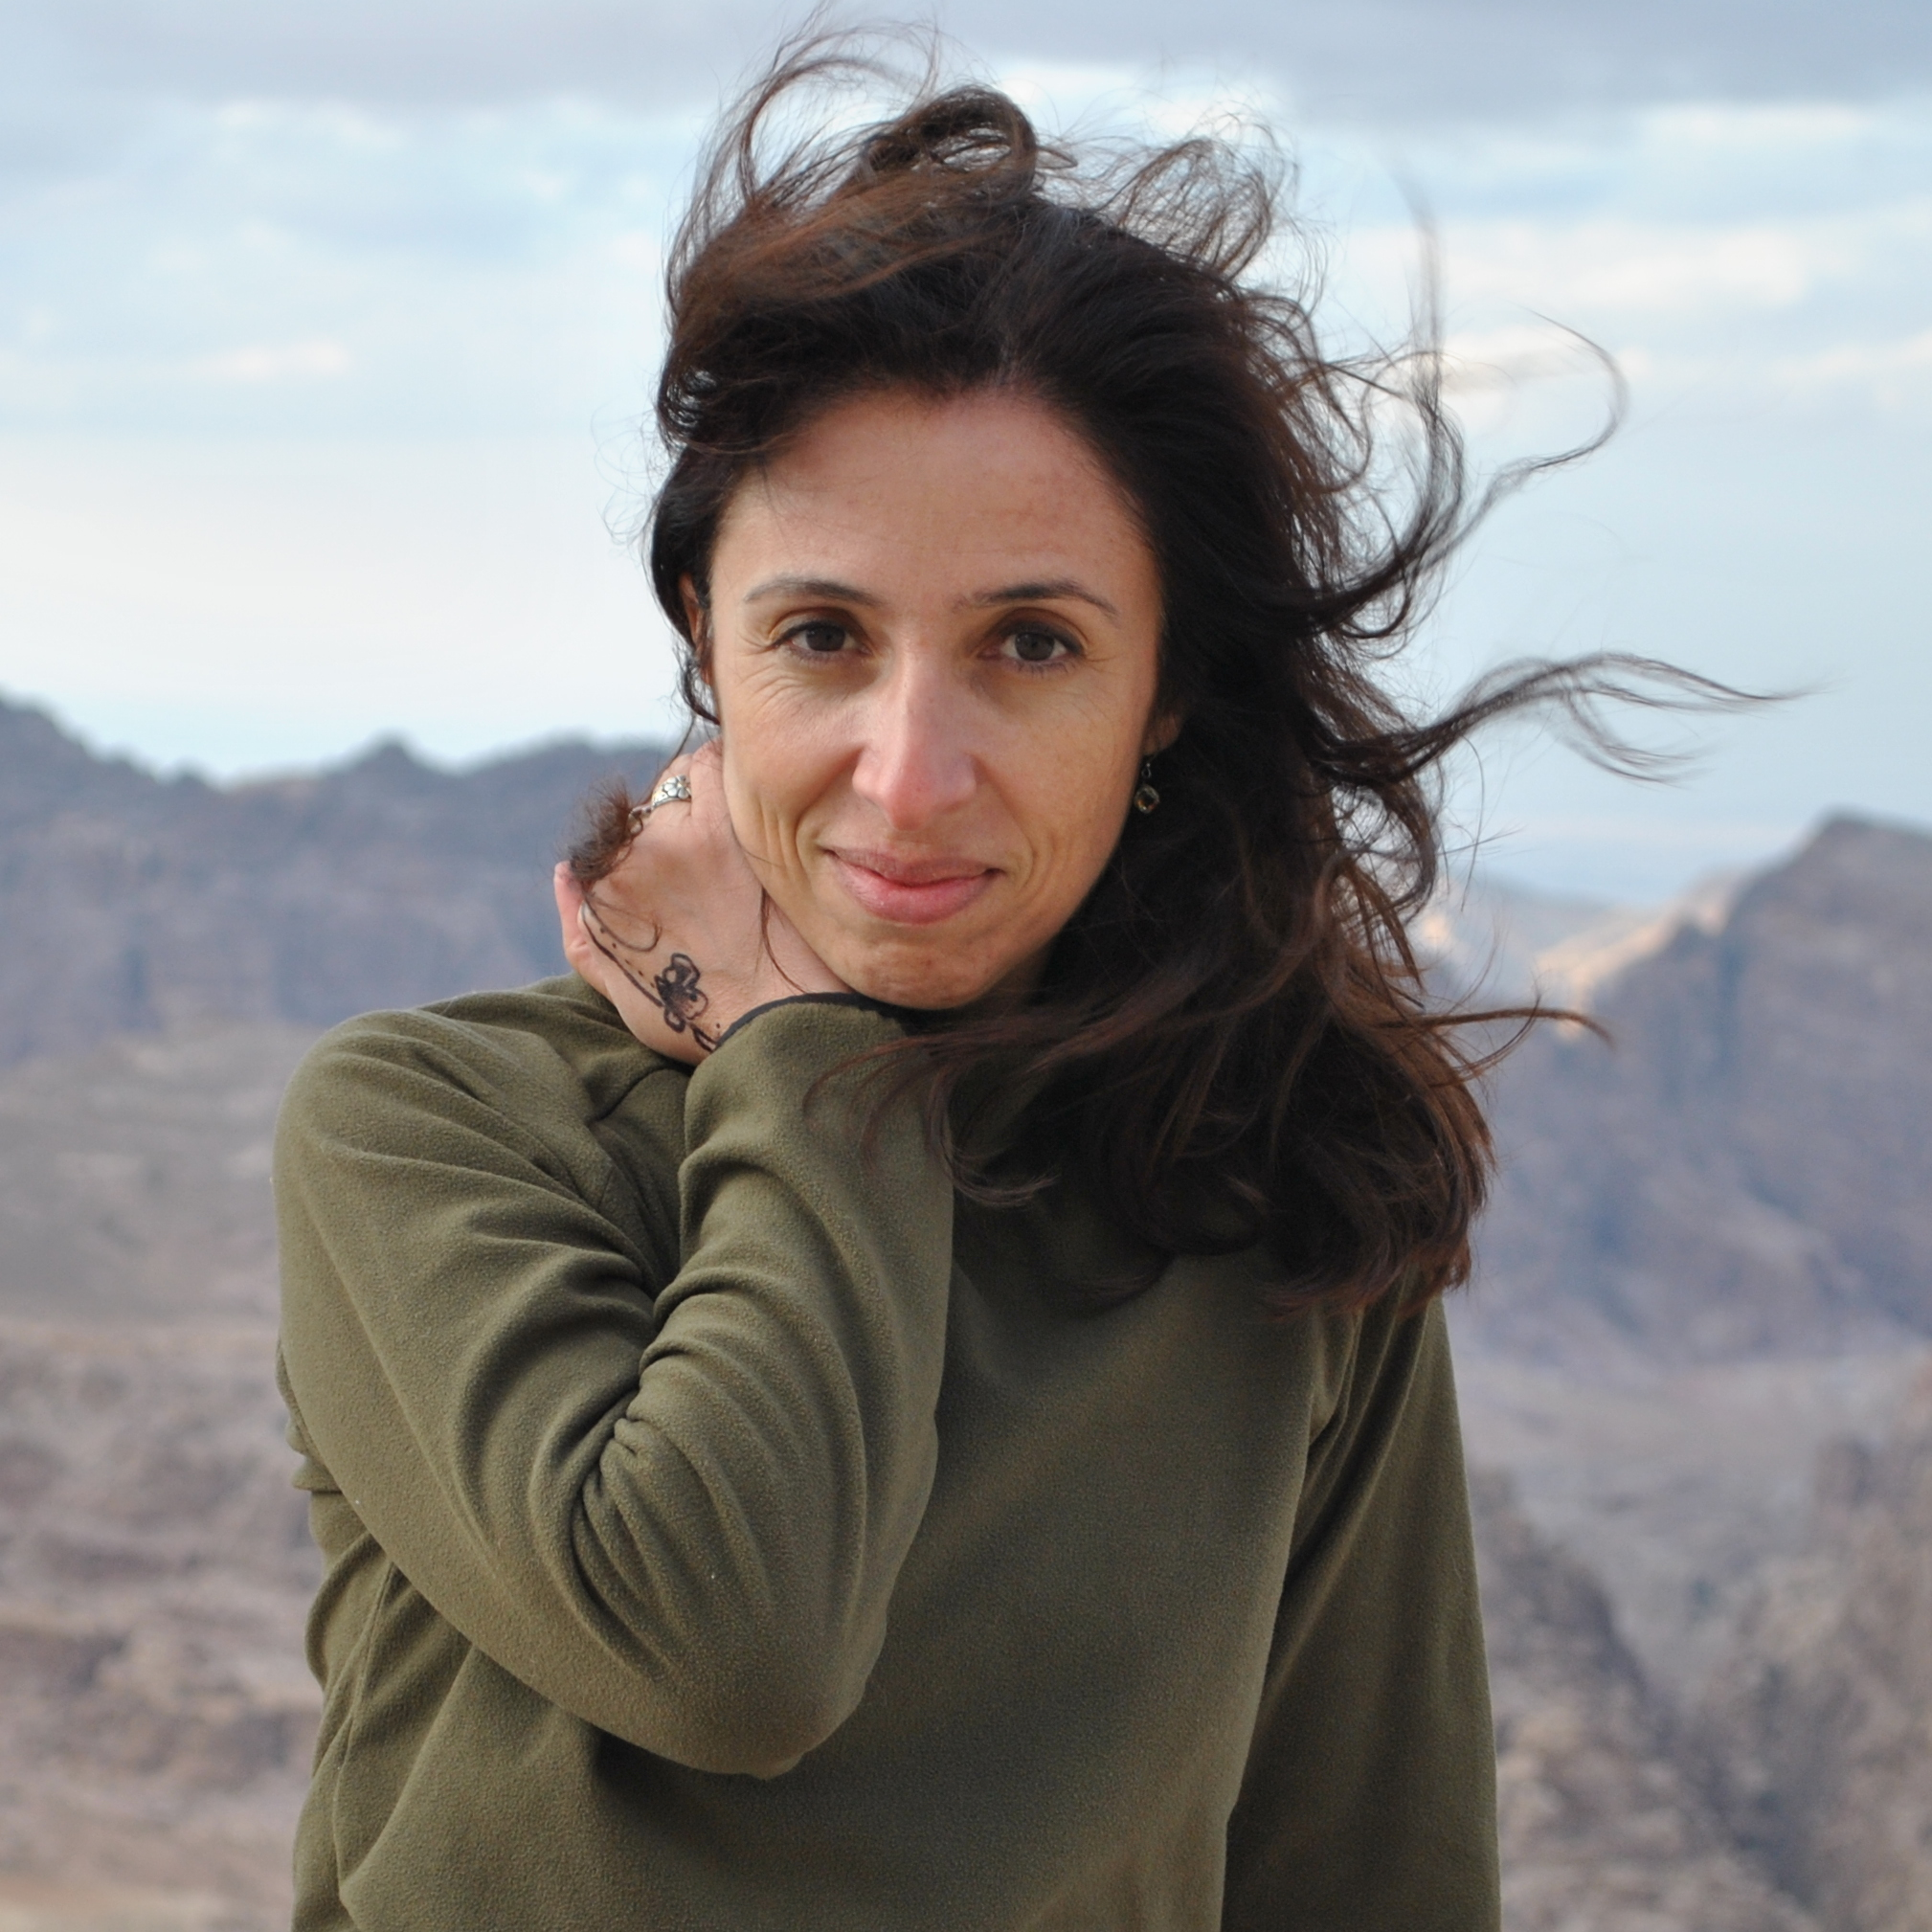 Analía Verónica Cayolo